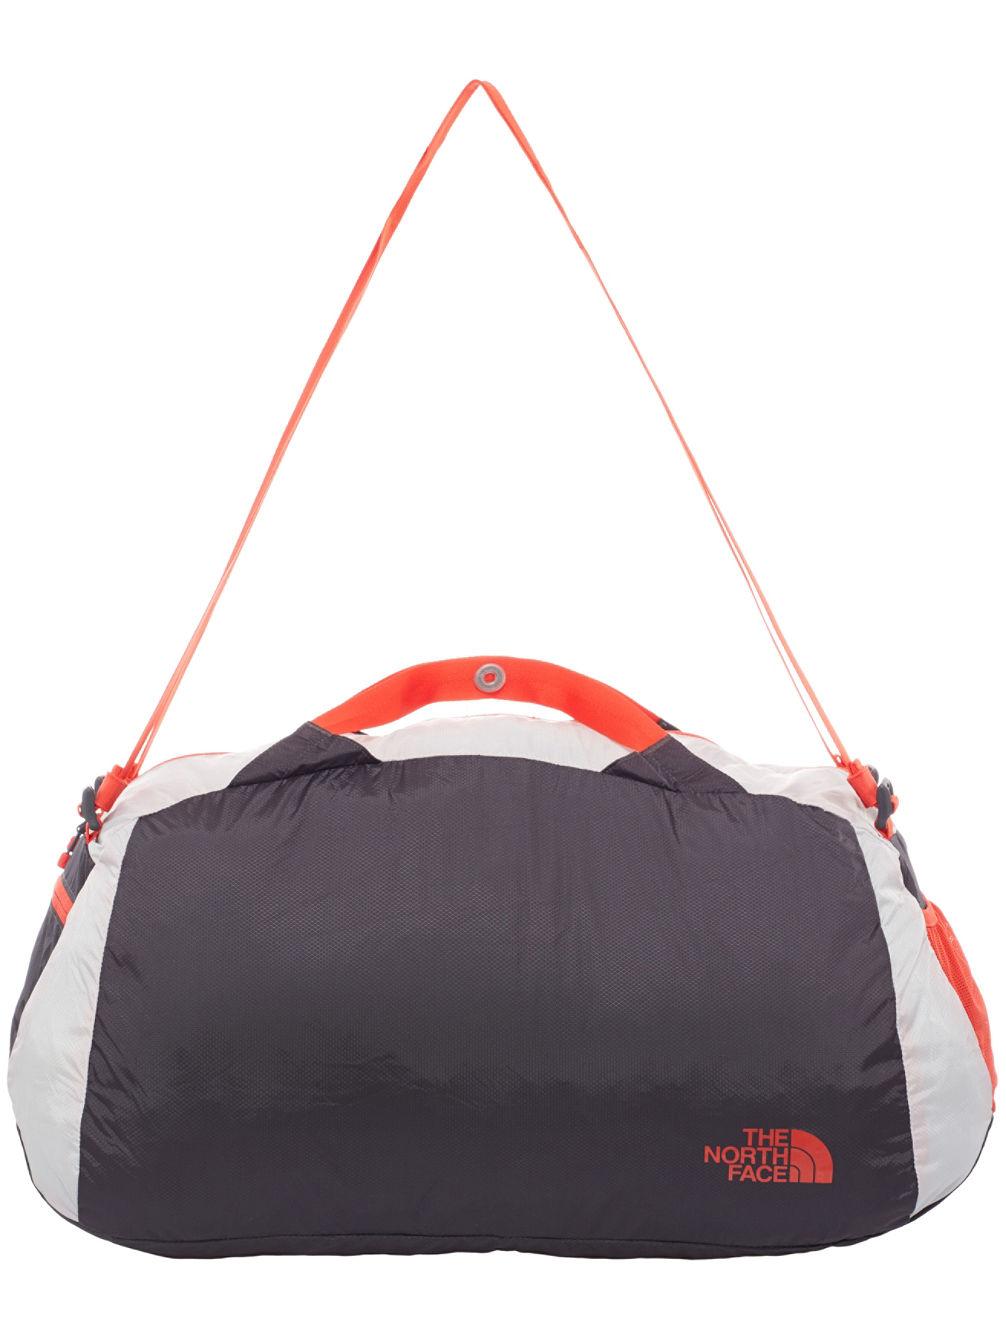 the north face flyweight duffel tasche online kaufen bei. Black Bedroom Furniture Sets. Home Design Ideas